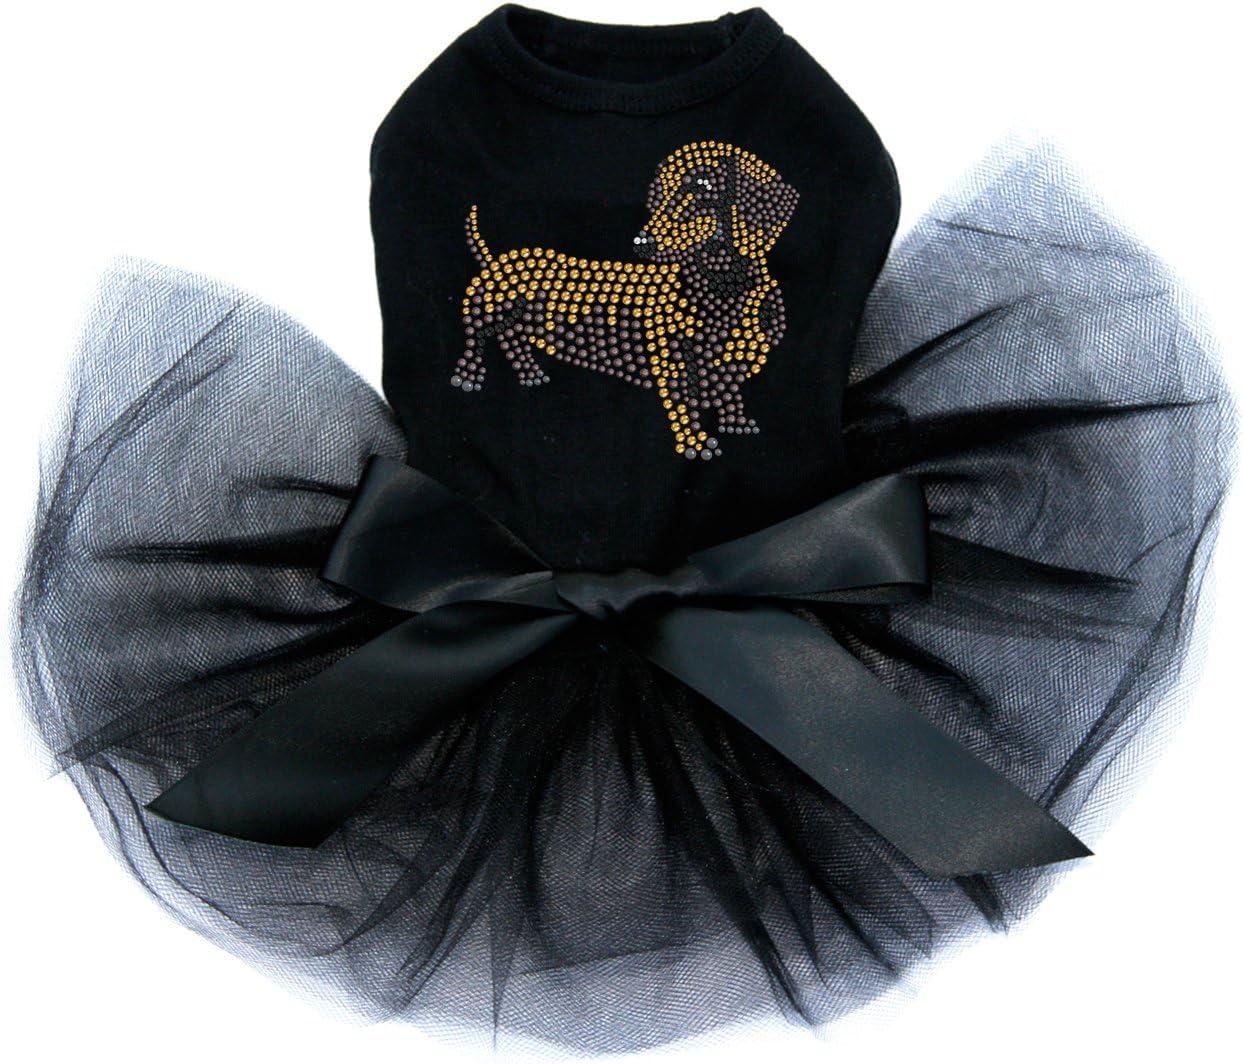 Dachshund # 2 price Bling Rhinestone Dress Tutu Black 4XL Dog shop